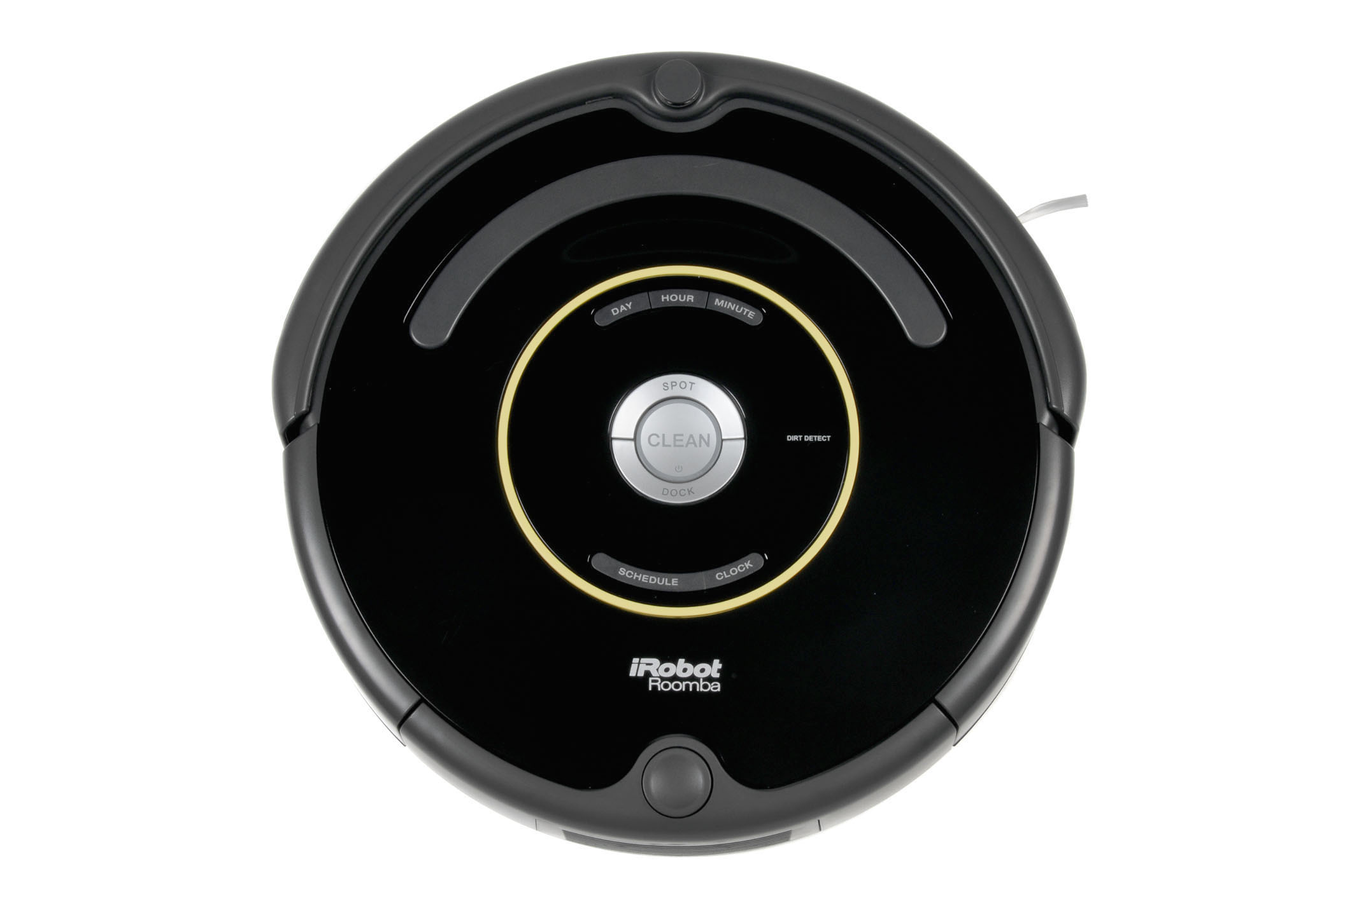 aspirateur robot irobot roomba 650 2 murs virtuels roomba 3640108 darty. Black Bedroom Furniture Sets. Home Design Ideas